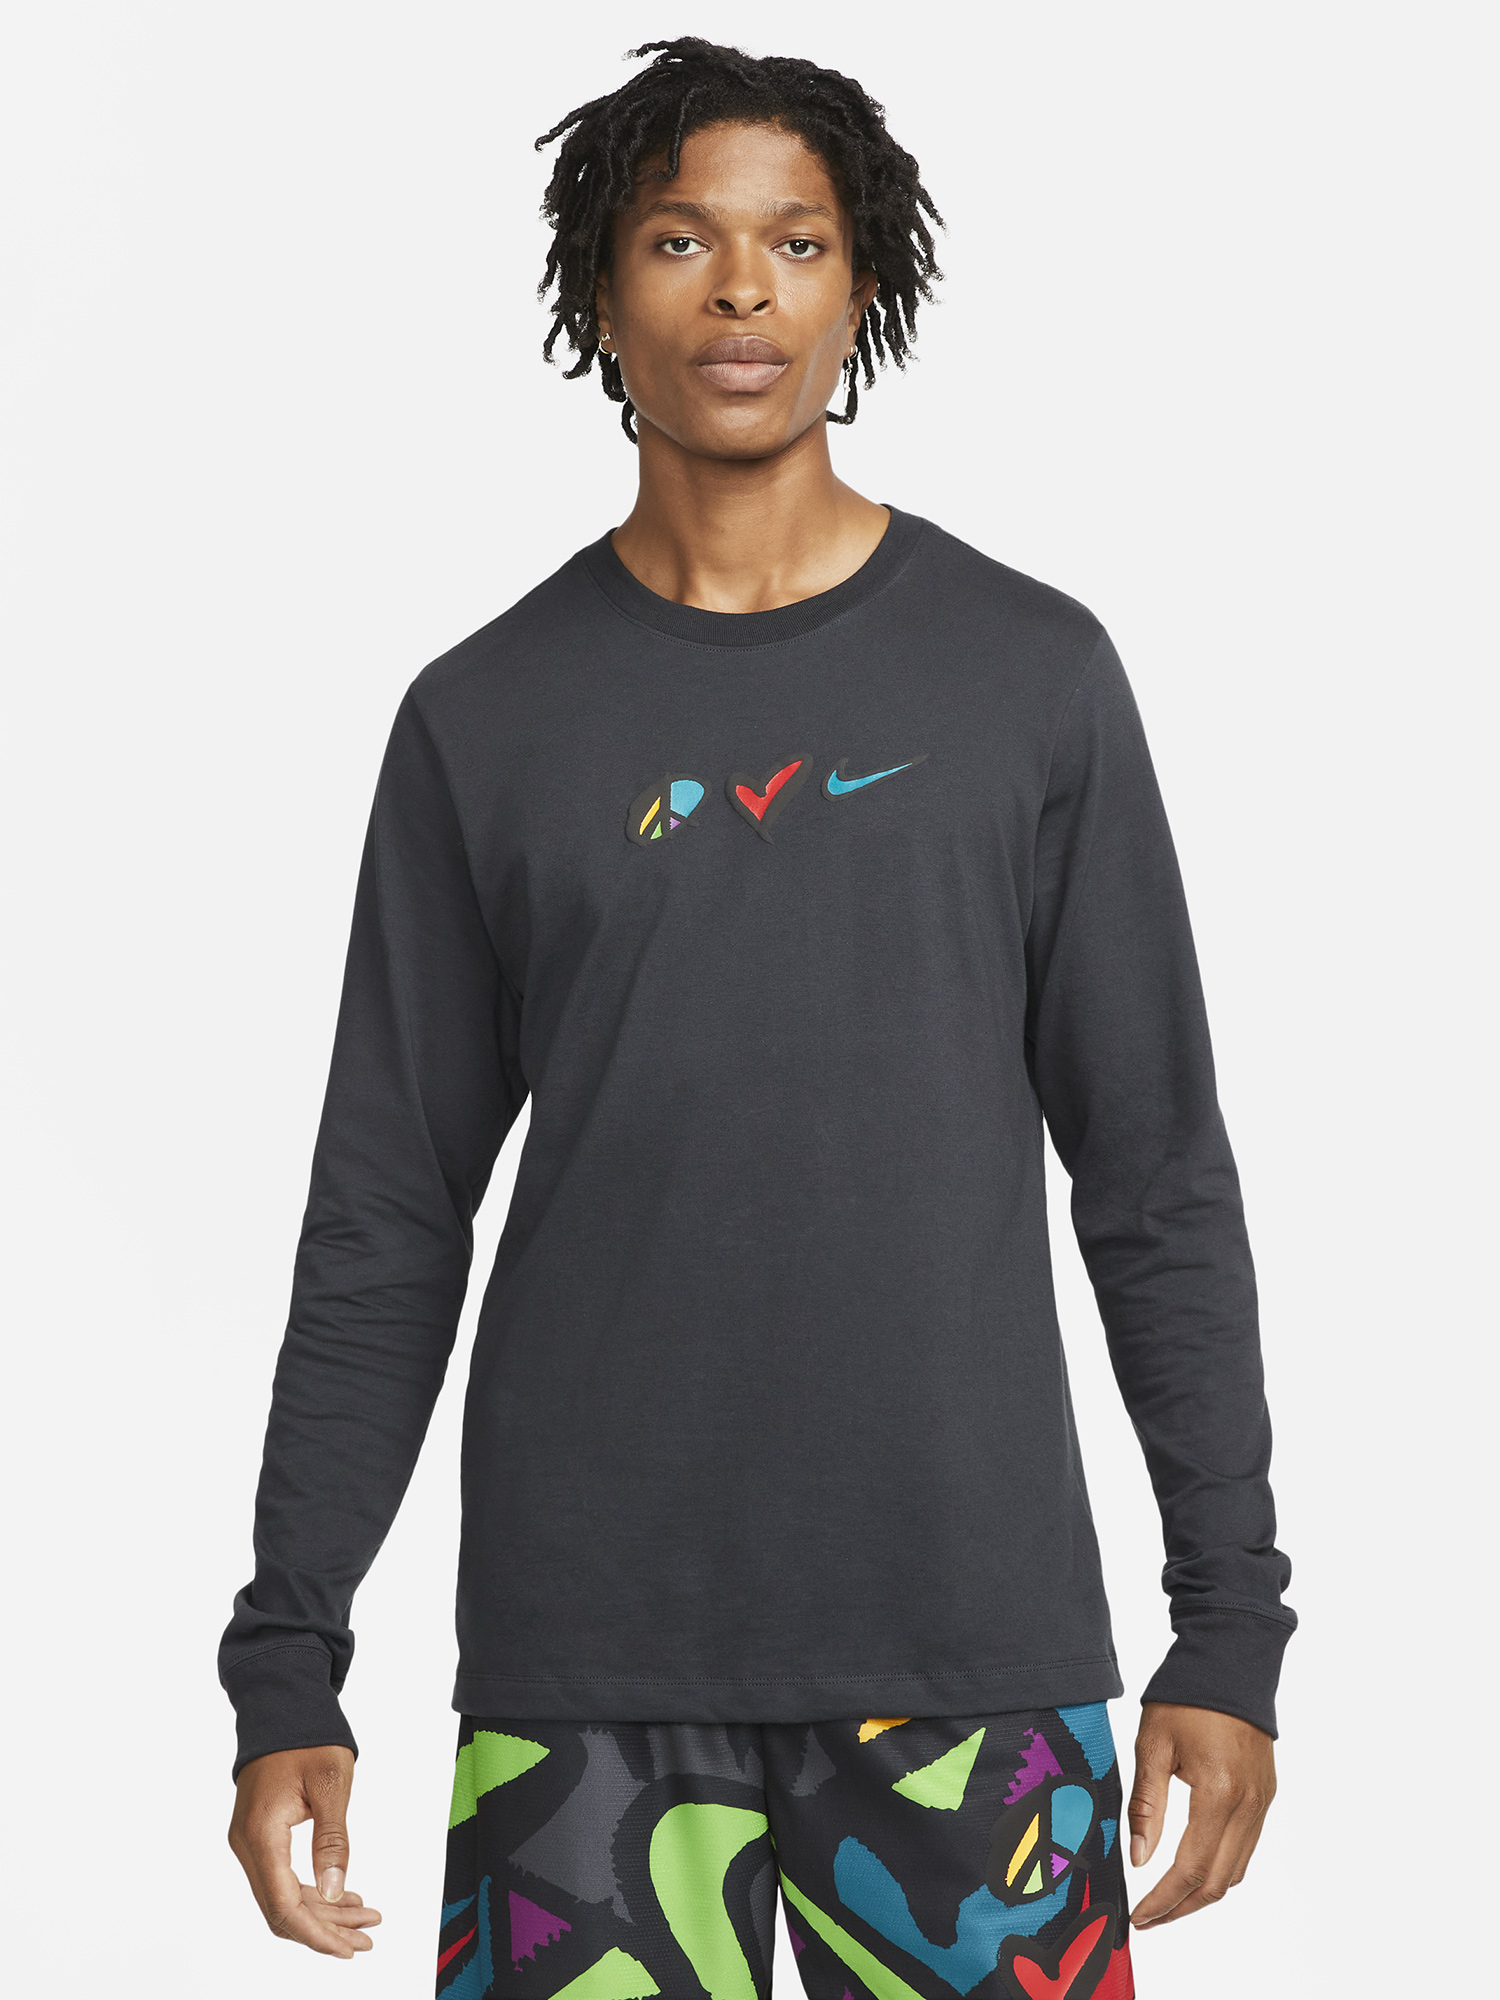 nike-peace-love-swoosh-long-sleeve-shirt-1